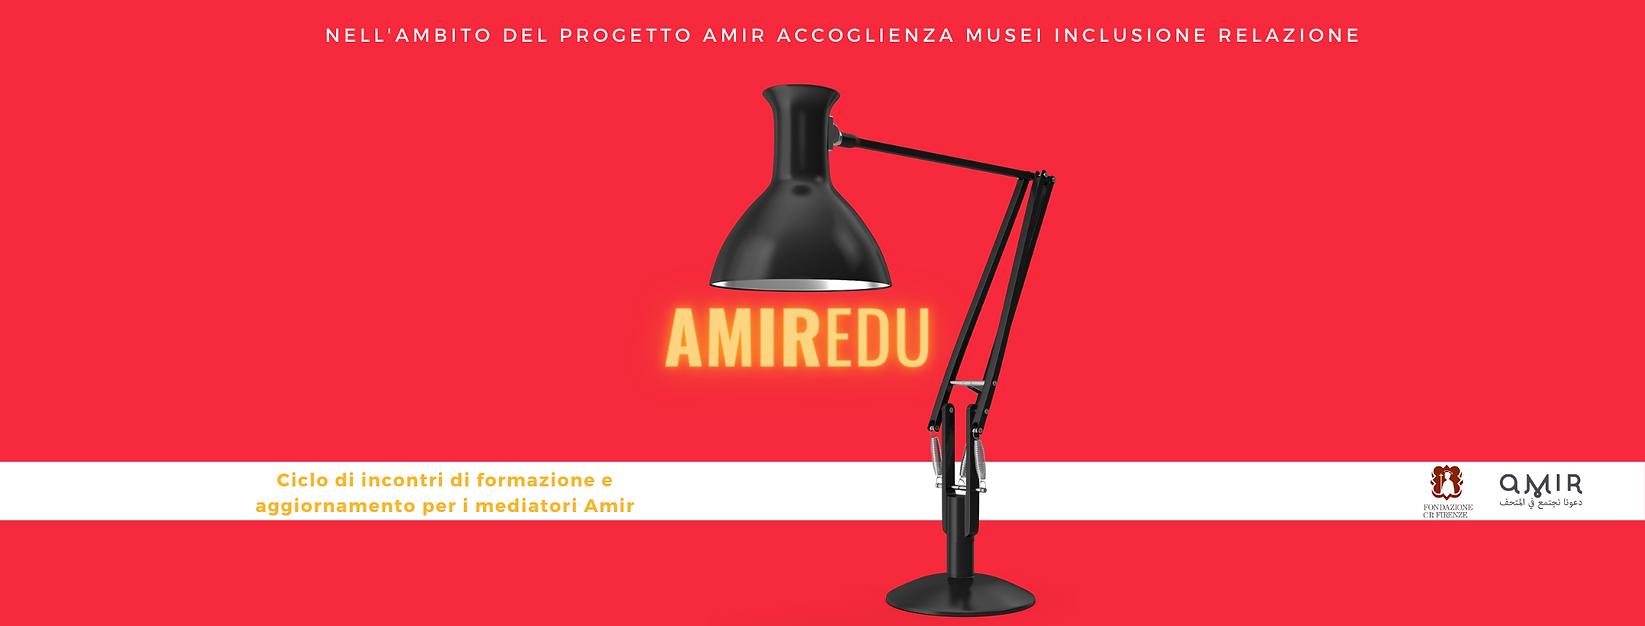 AmirEdu FB.png